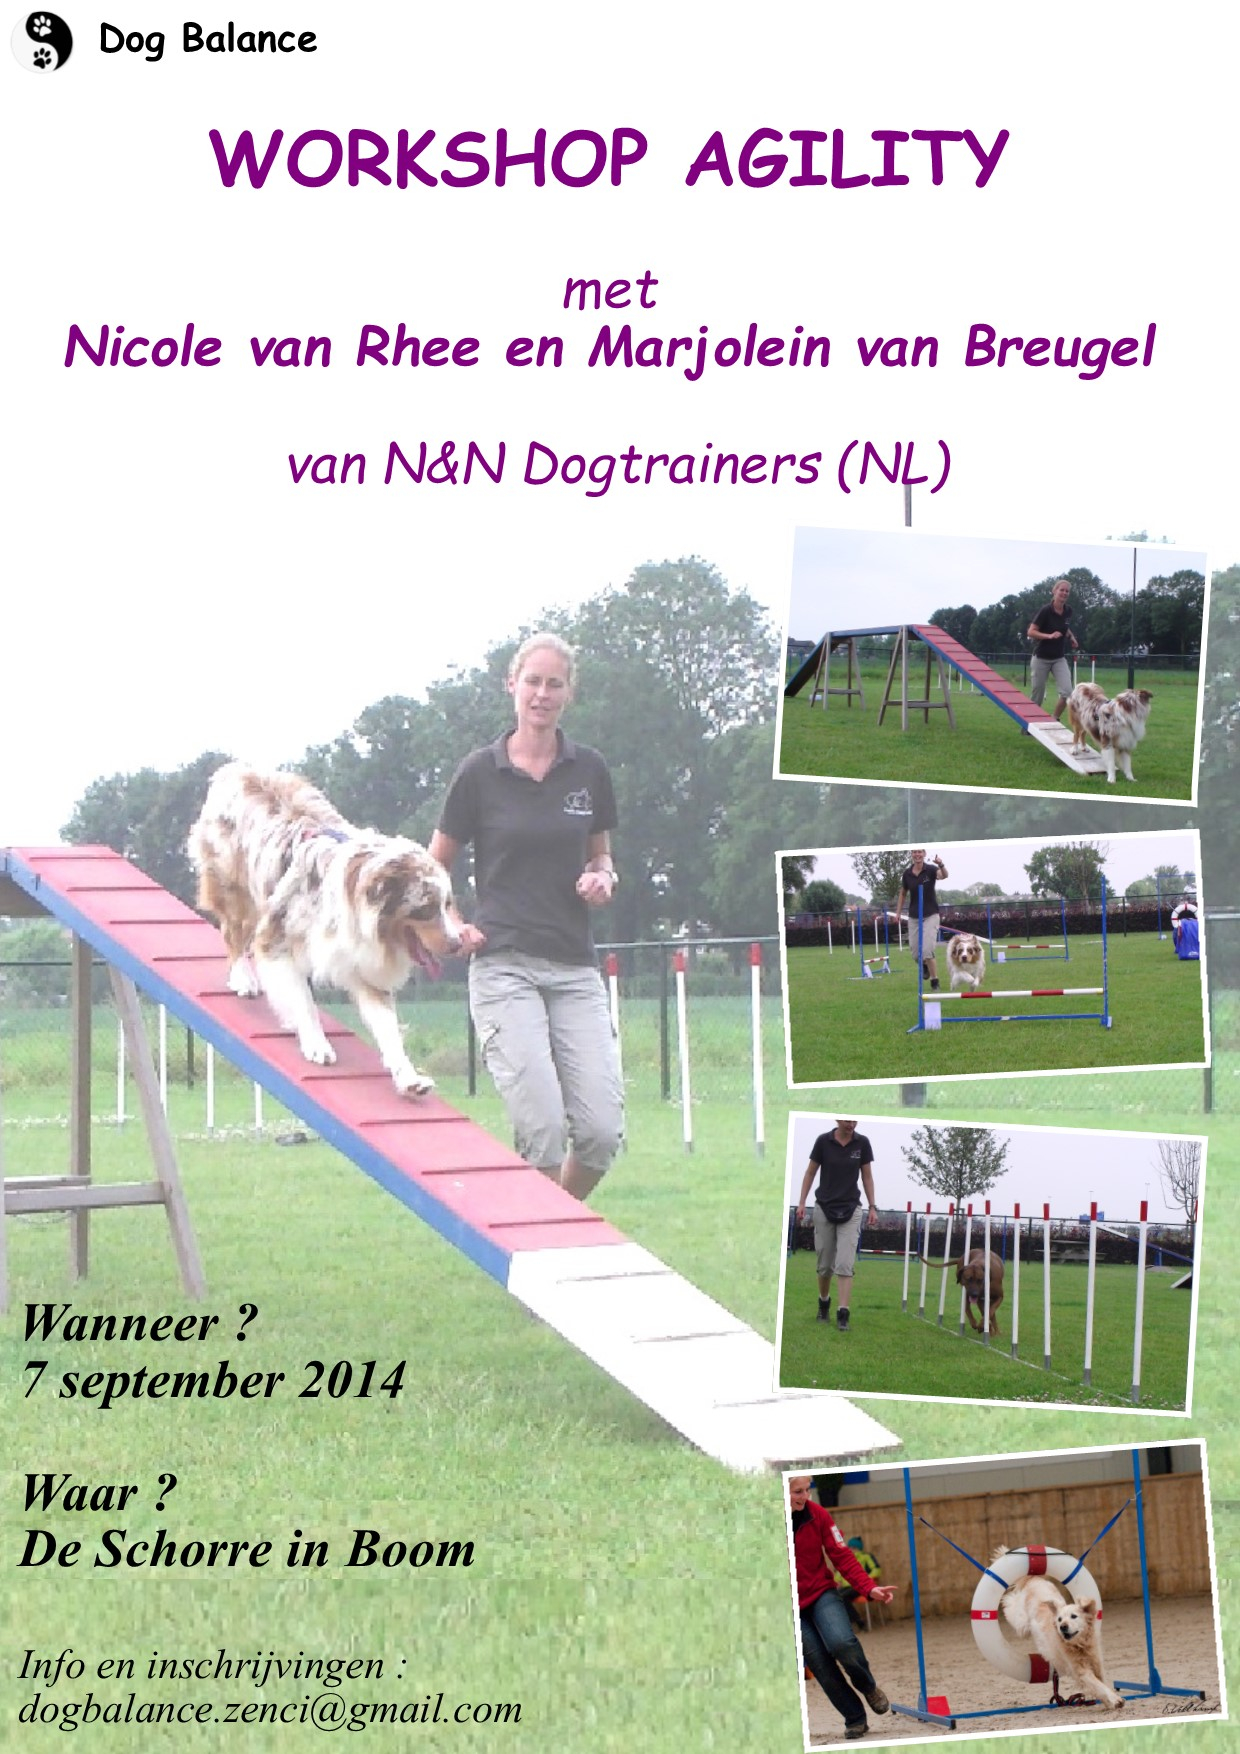 Workshop Agility | Dog Balance